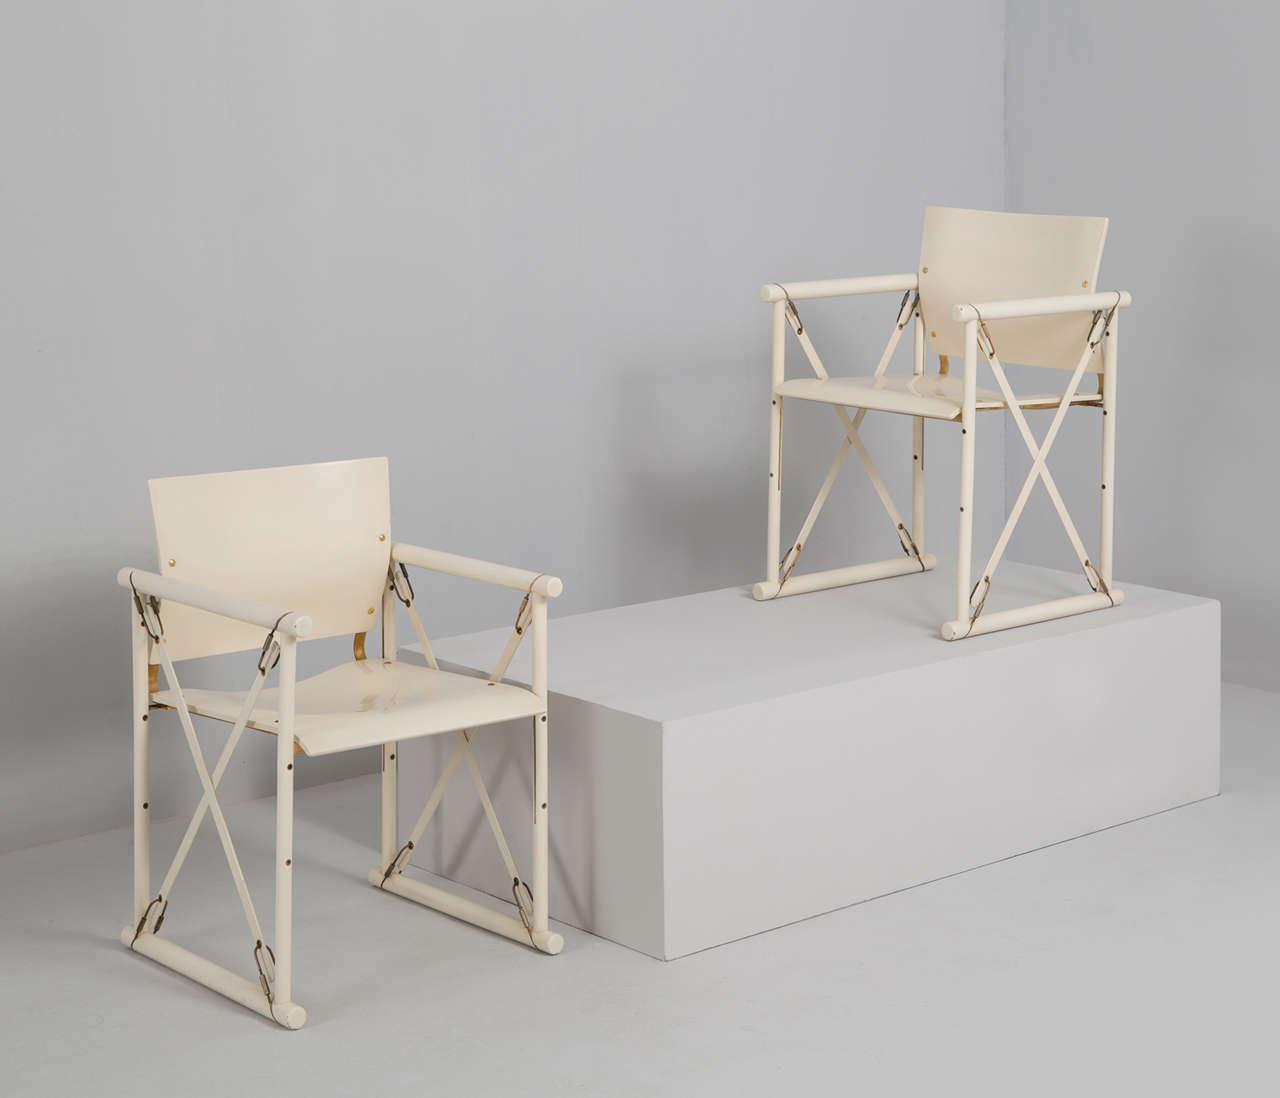 Off White Belgian Dining Room Set By F Van Praet 1981 For Sale At 1stdibs